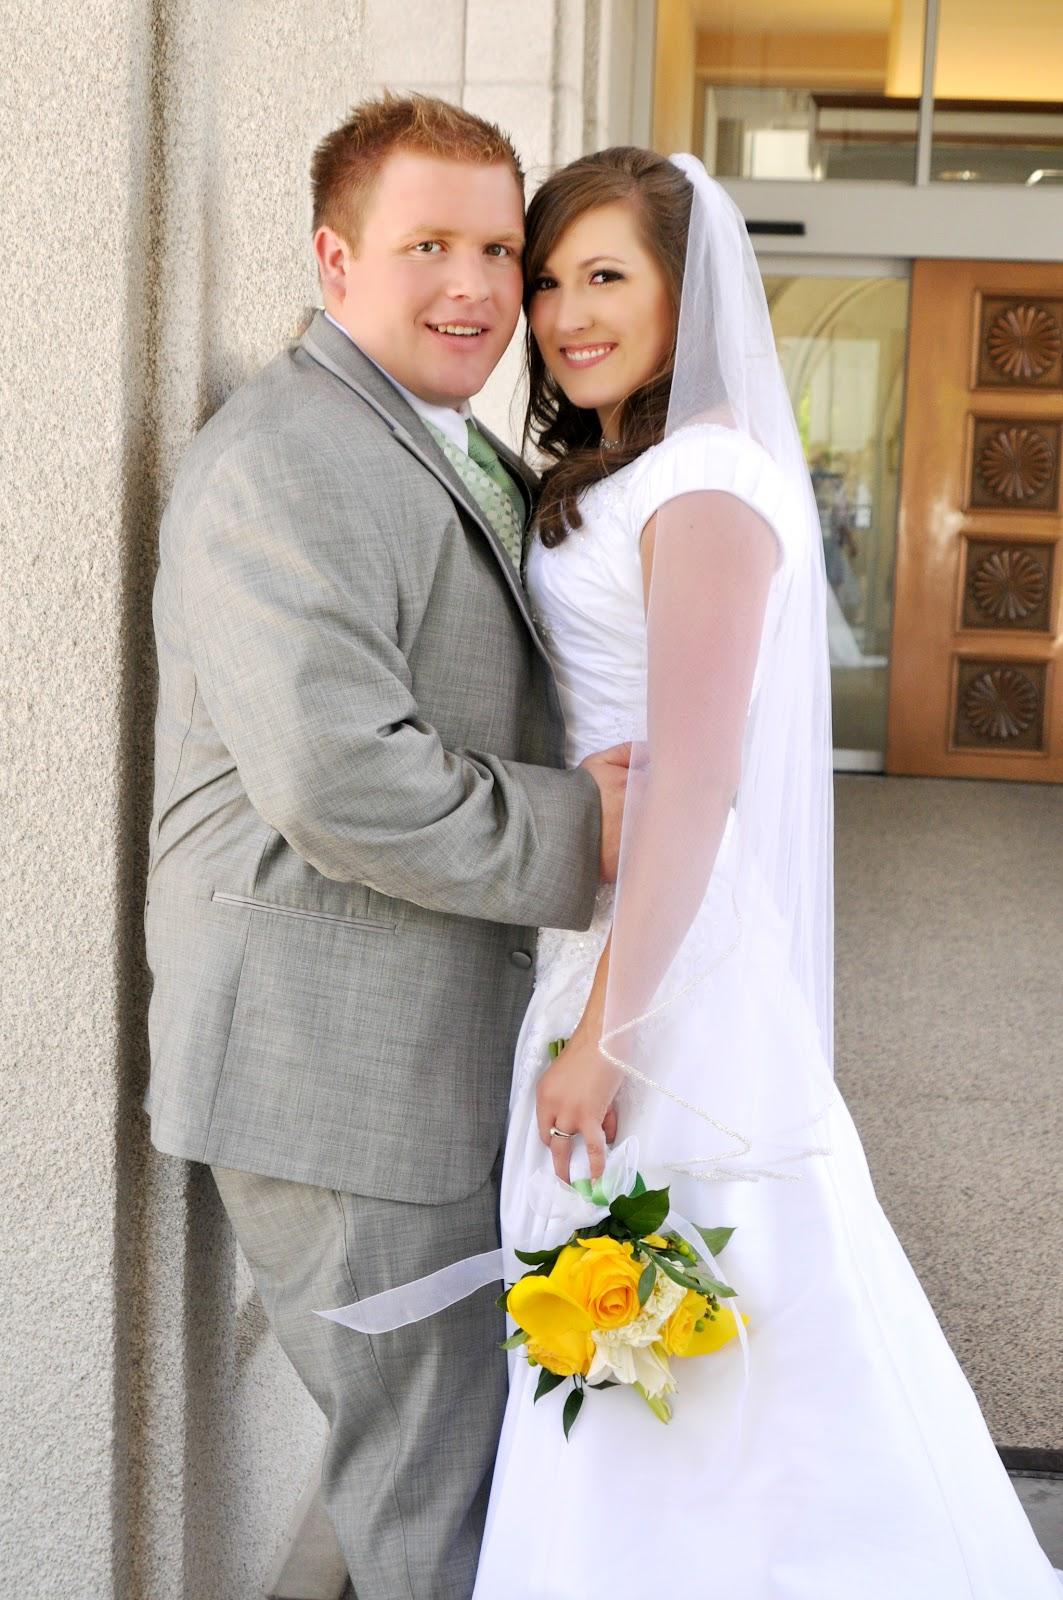 Cheap Wedding Photography Utah: Utah Photography: Wedding: Natalie And Trenton